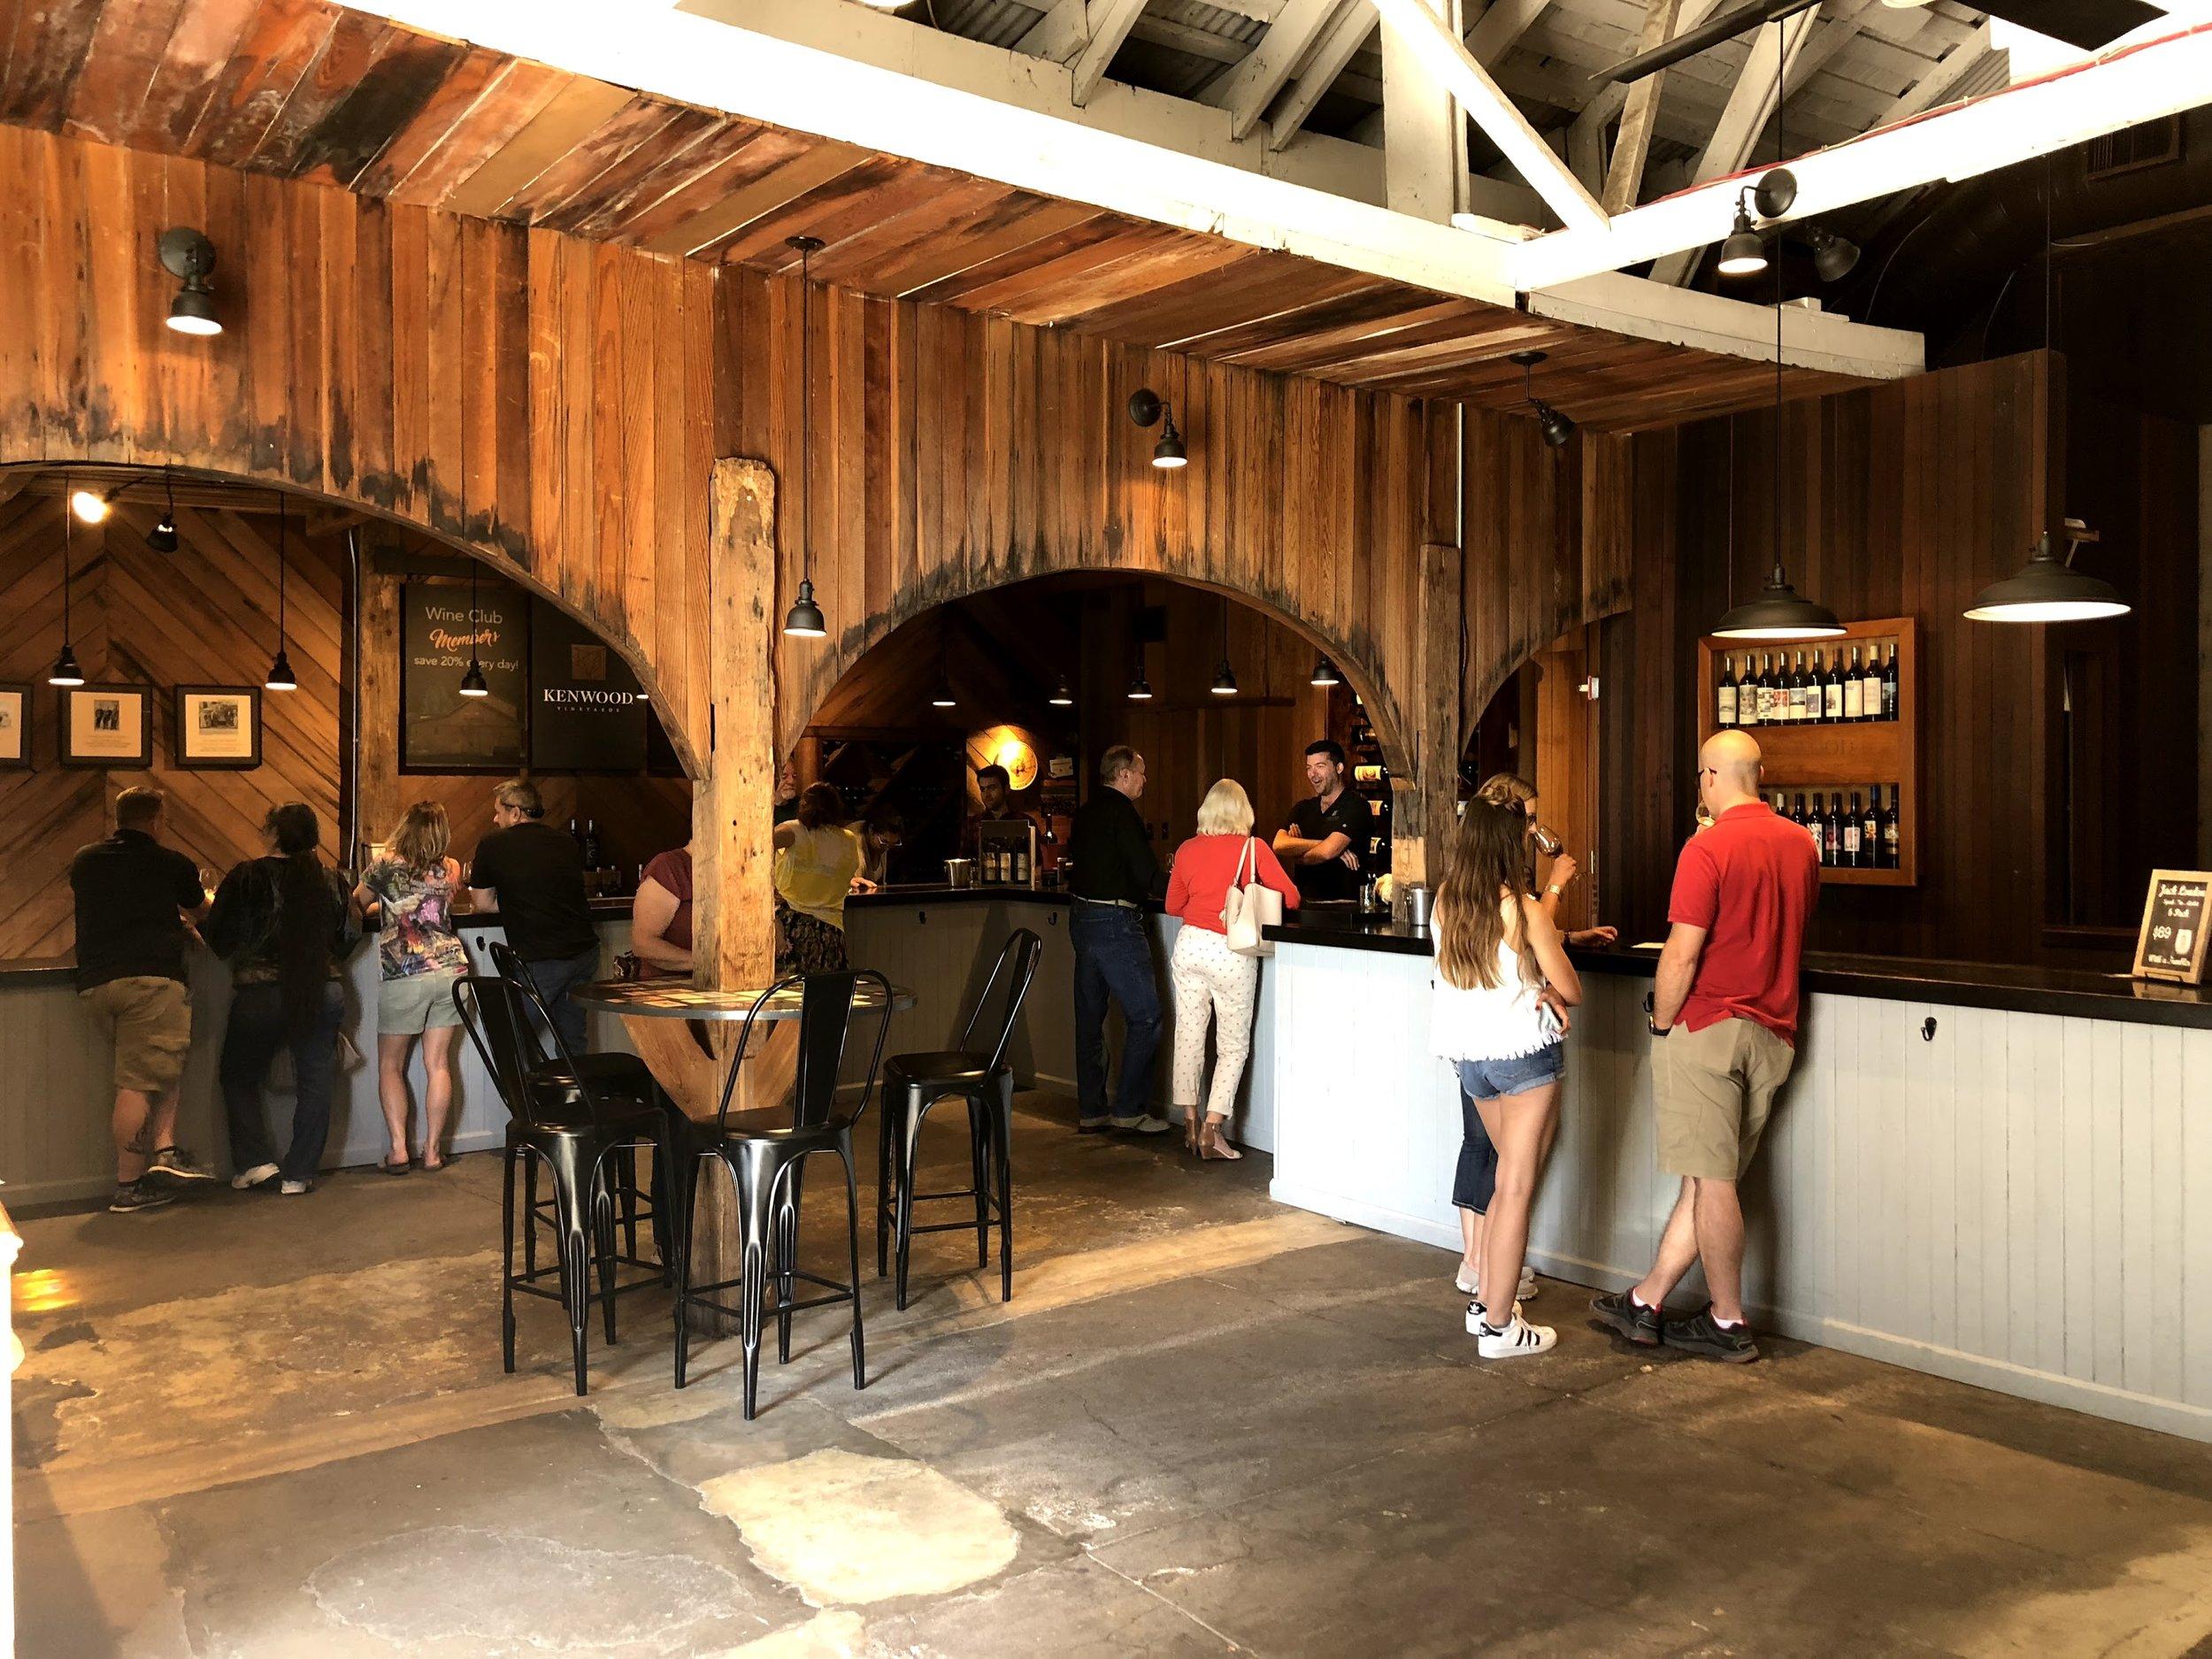 Old Barn Kenwood Winery